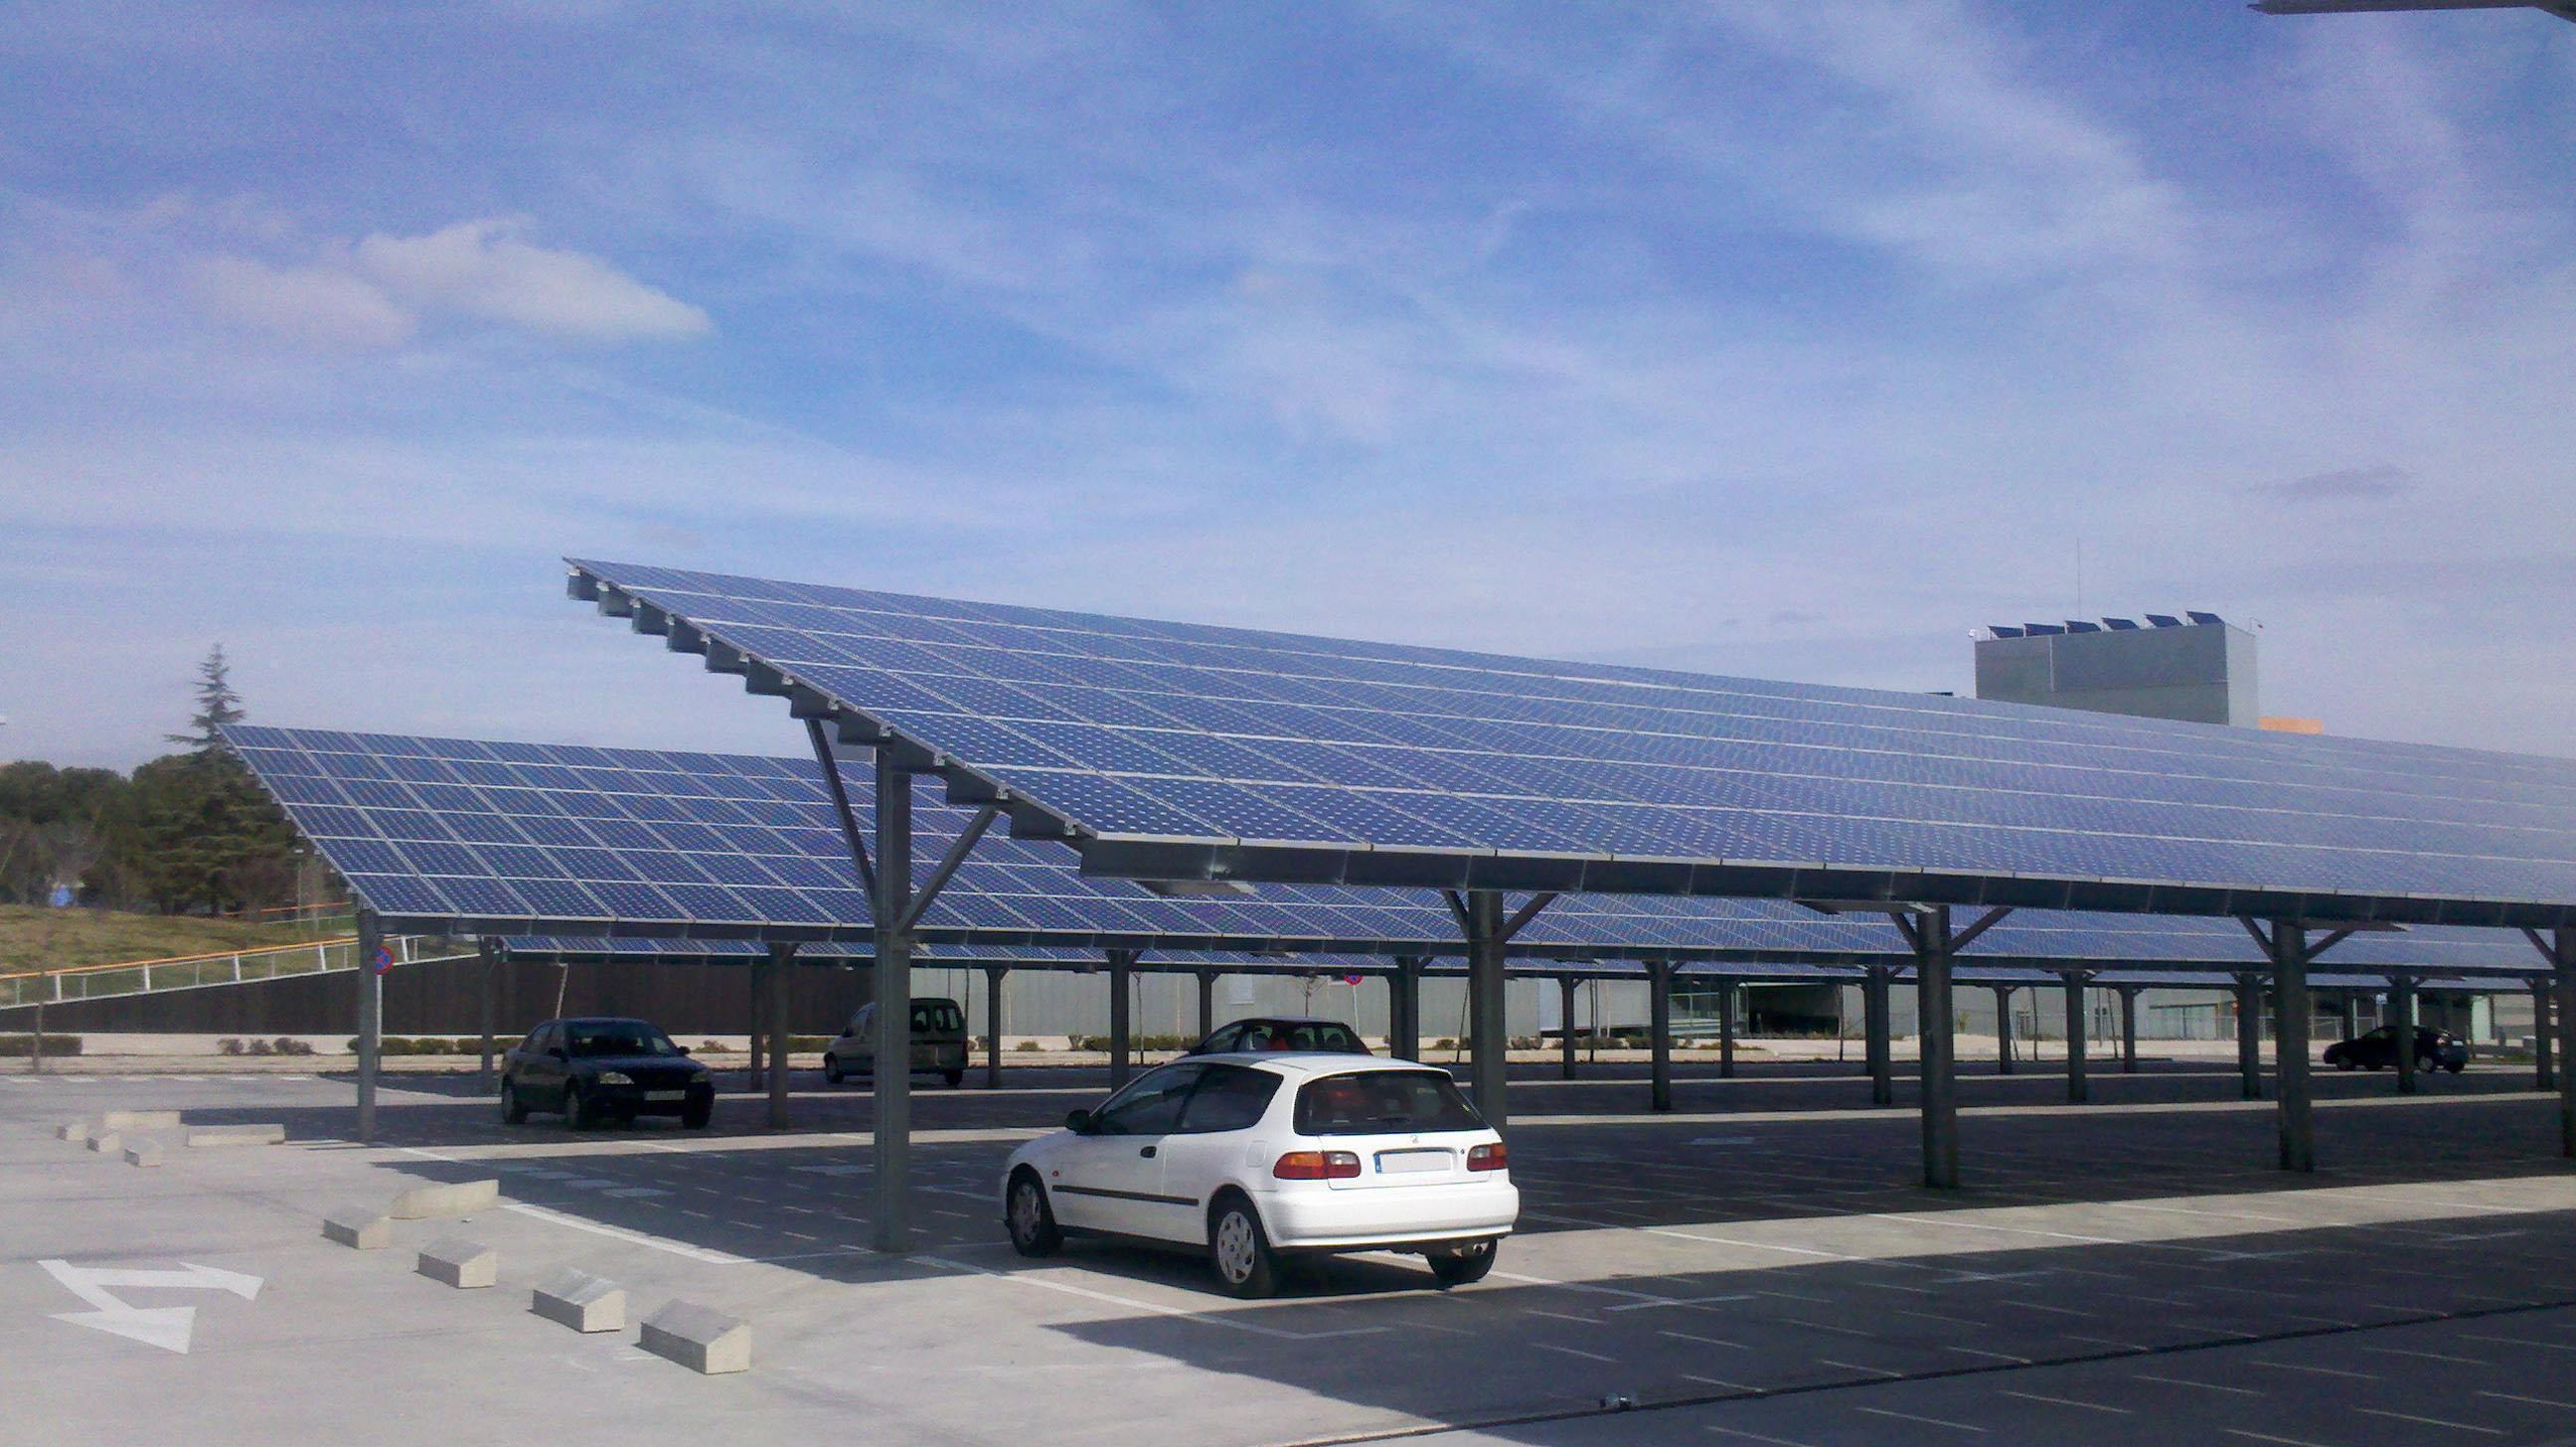 PV_solar_parking